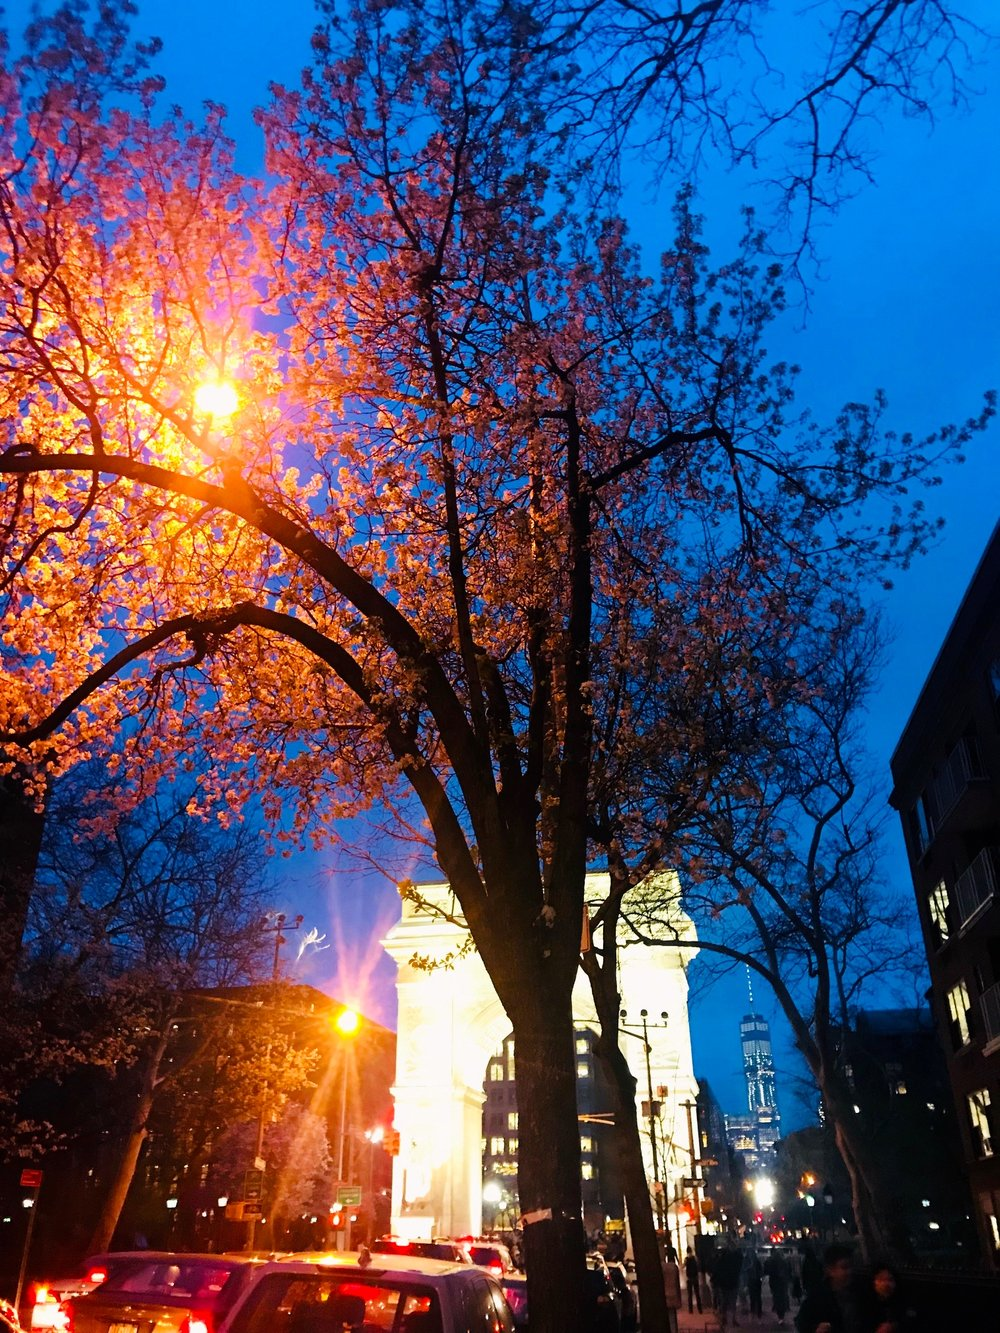 Evening, Washington Square Park, NYC